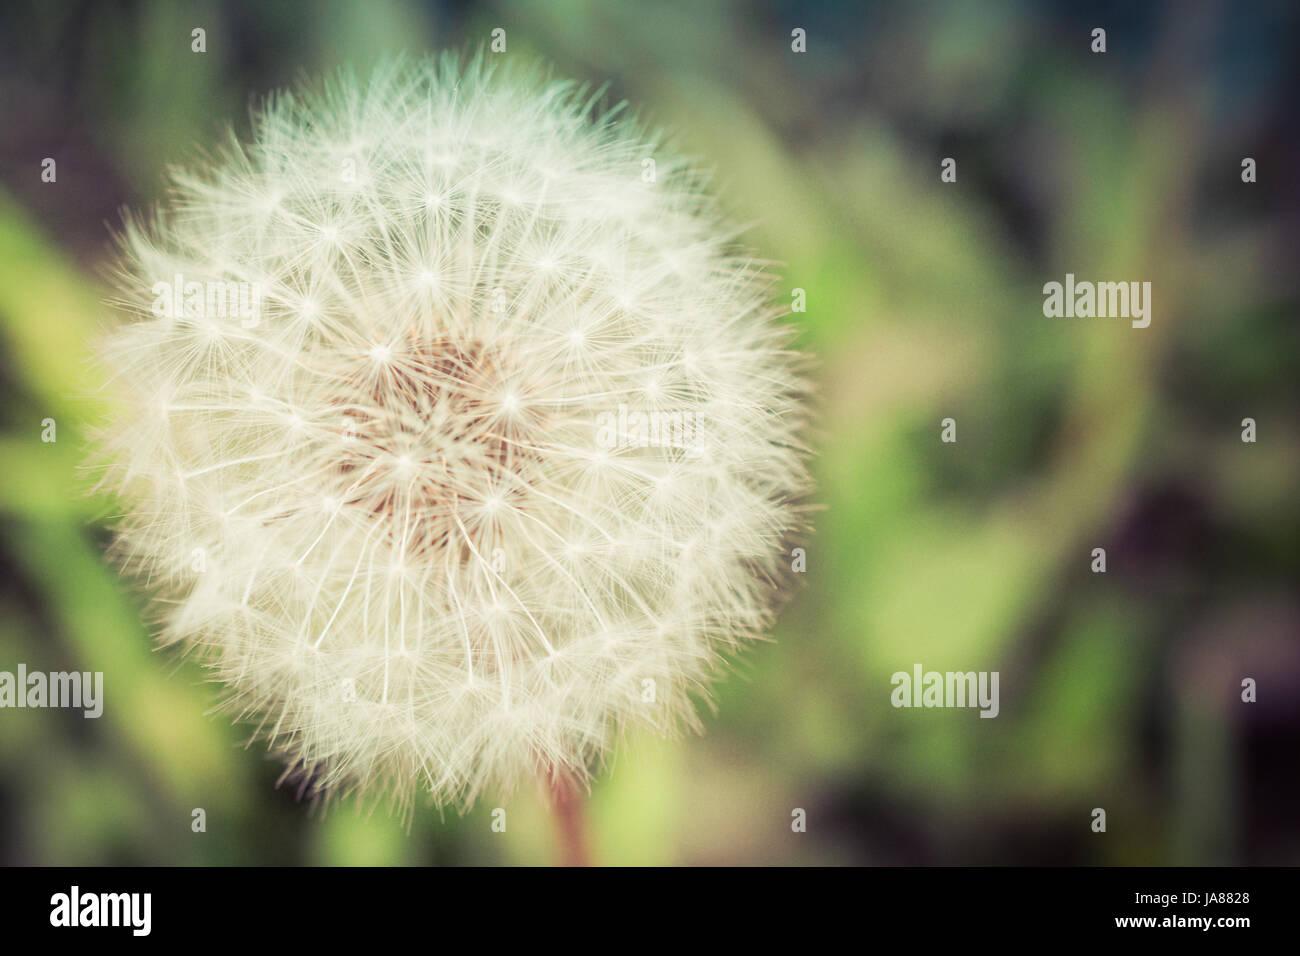 Summer Dandelion Seed Head - Stock Image